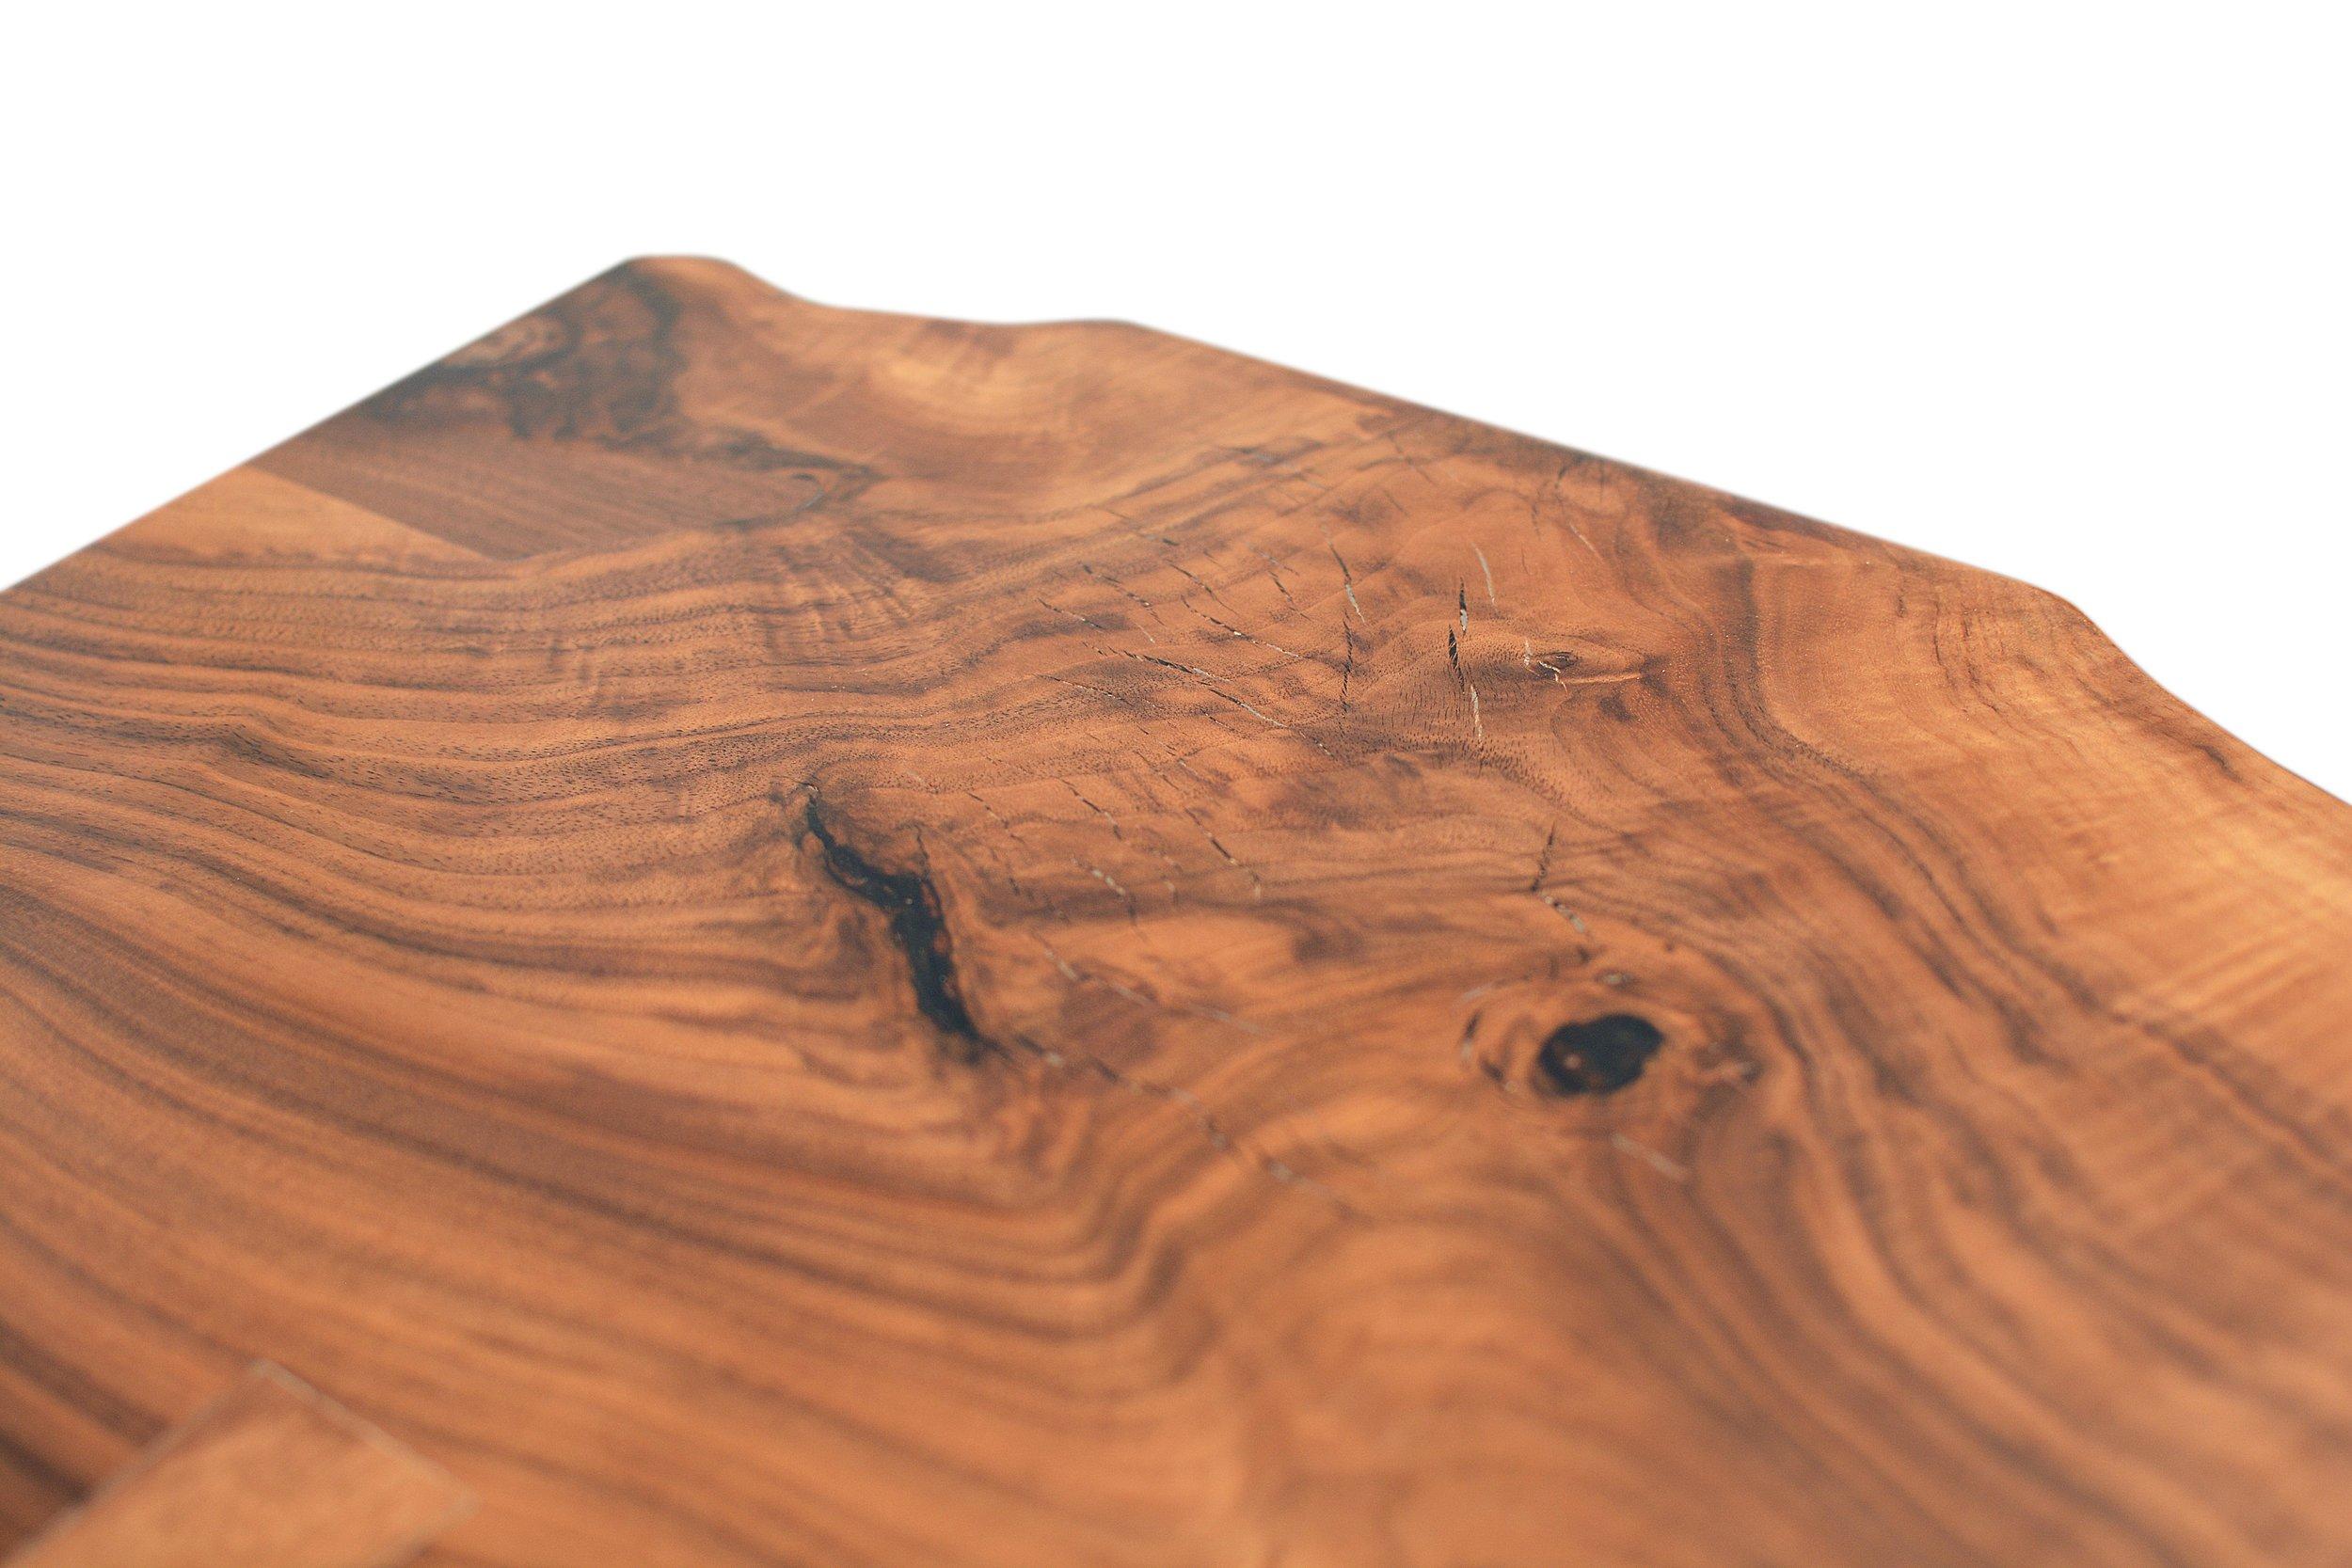 Etz & Steel Hermes Live Edge Walnut Table Close Up 15.JPG